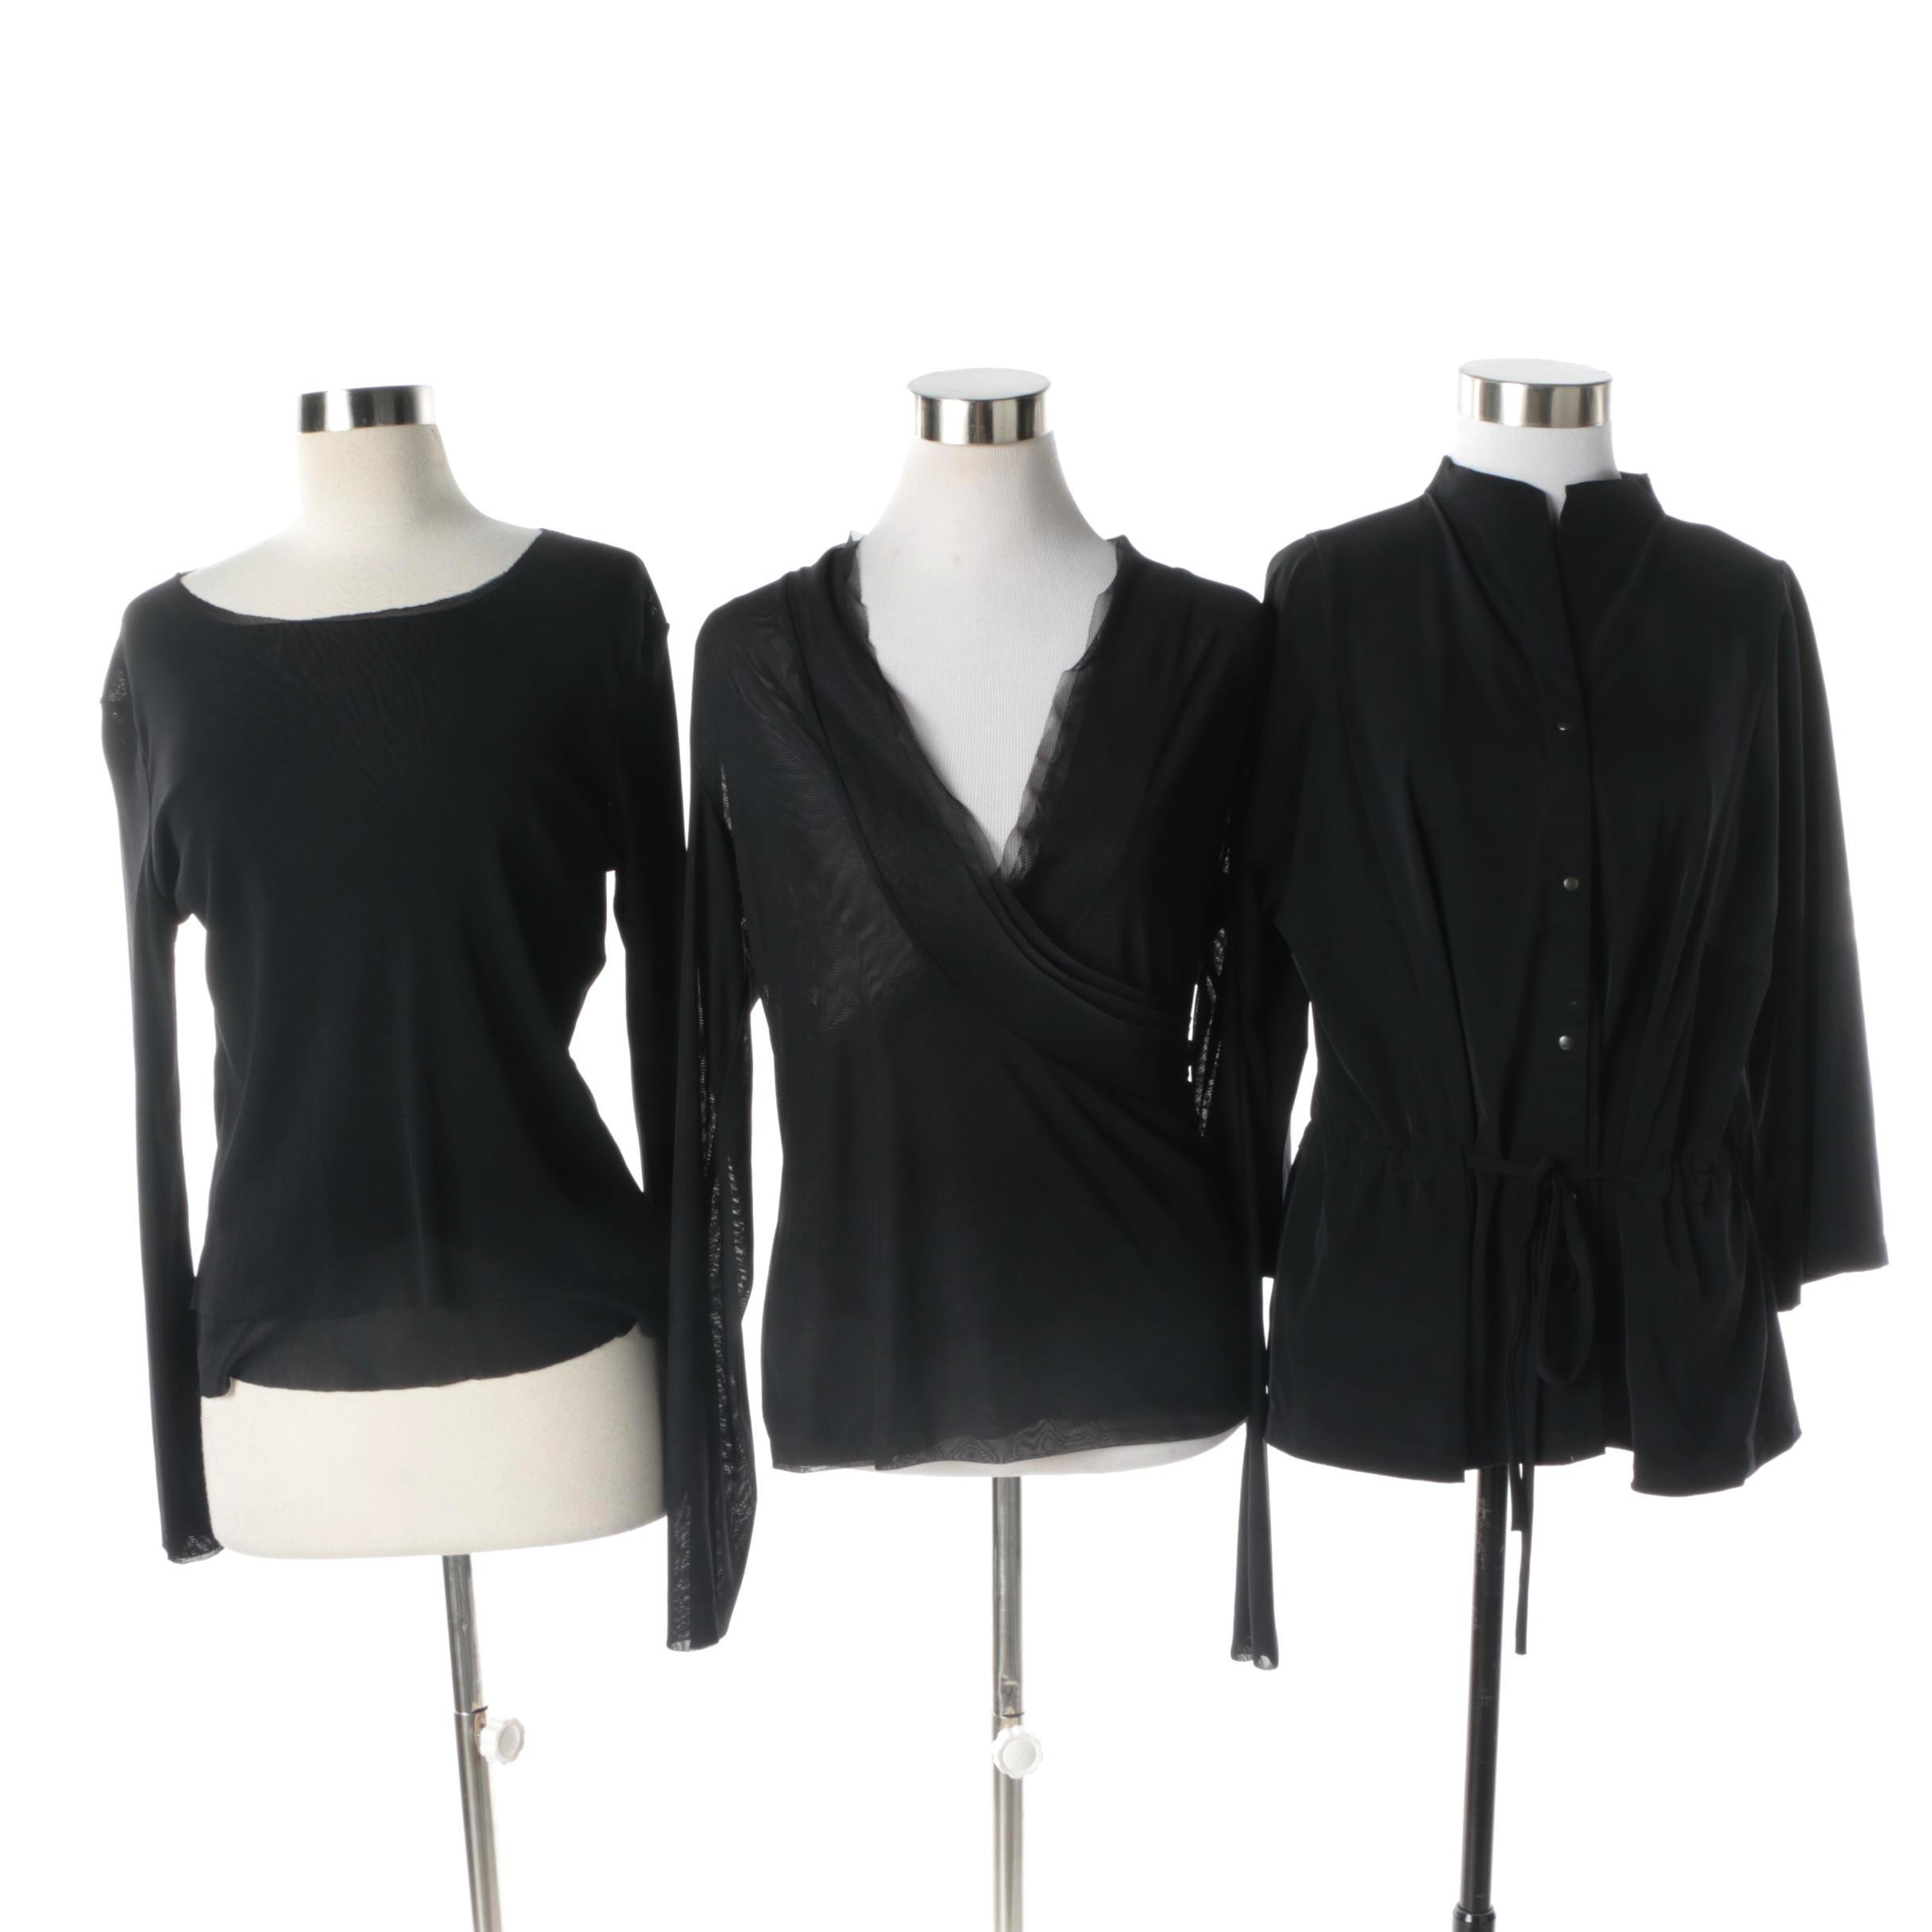 Women's Babette and Marie Saint Pierre Black Long Sleeve Tops